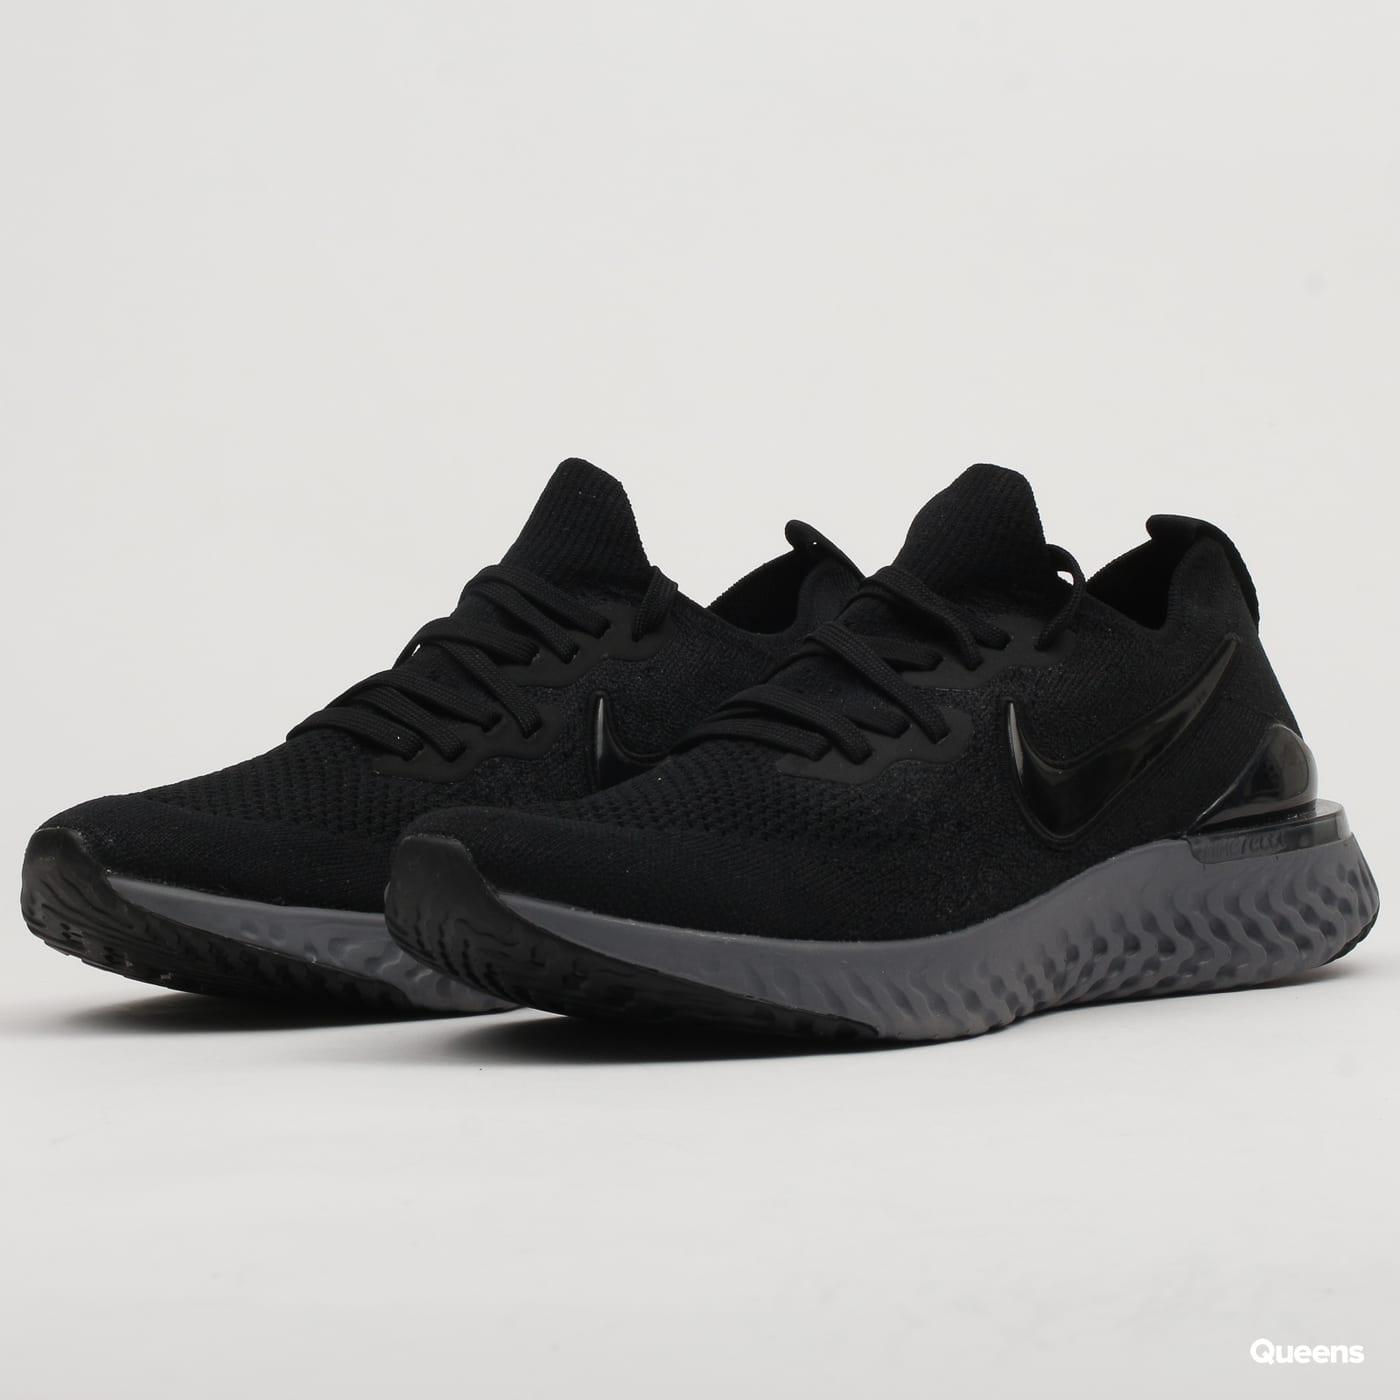 826cf6a0d19 Sneakers Nike Epic React Flyknit 2 (BQ8928-001)– Queens 💚